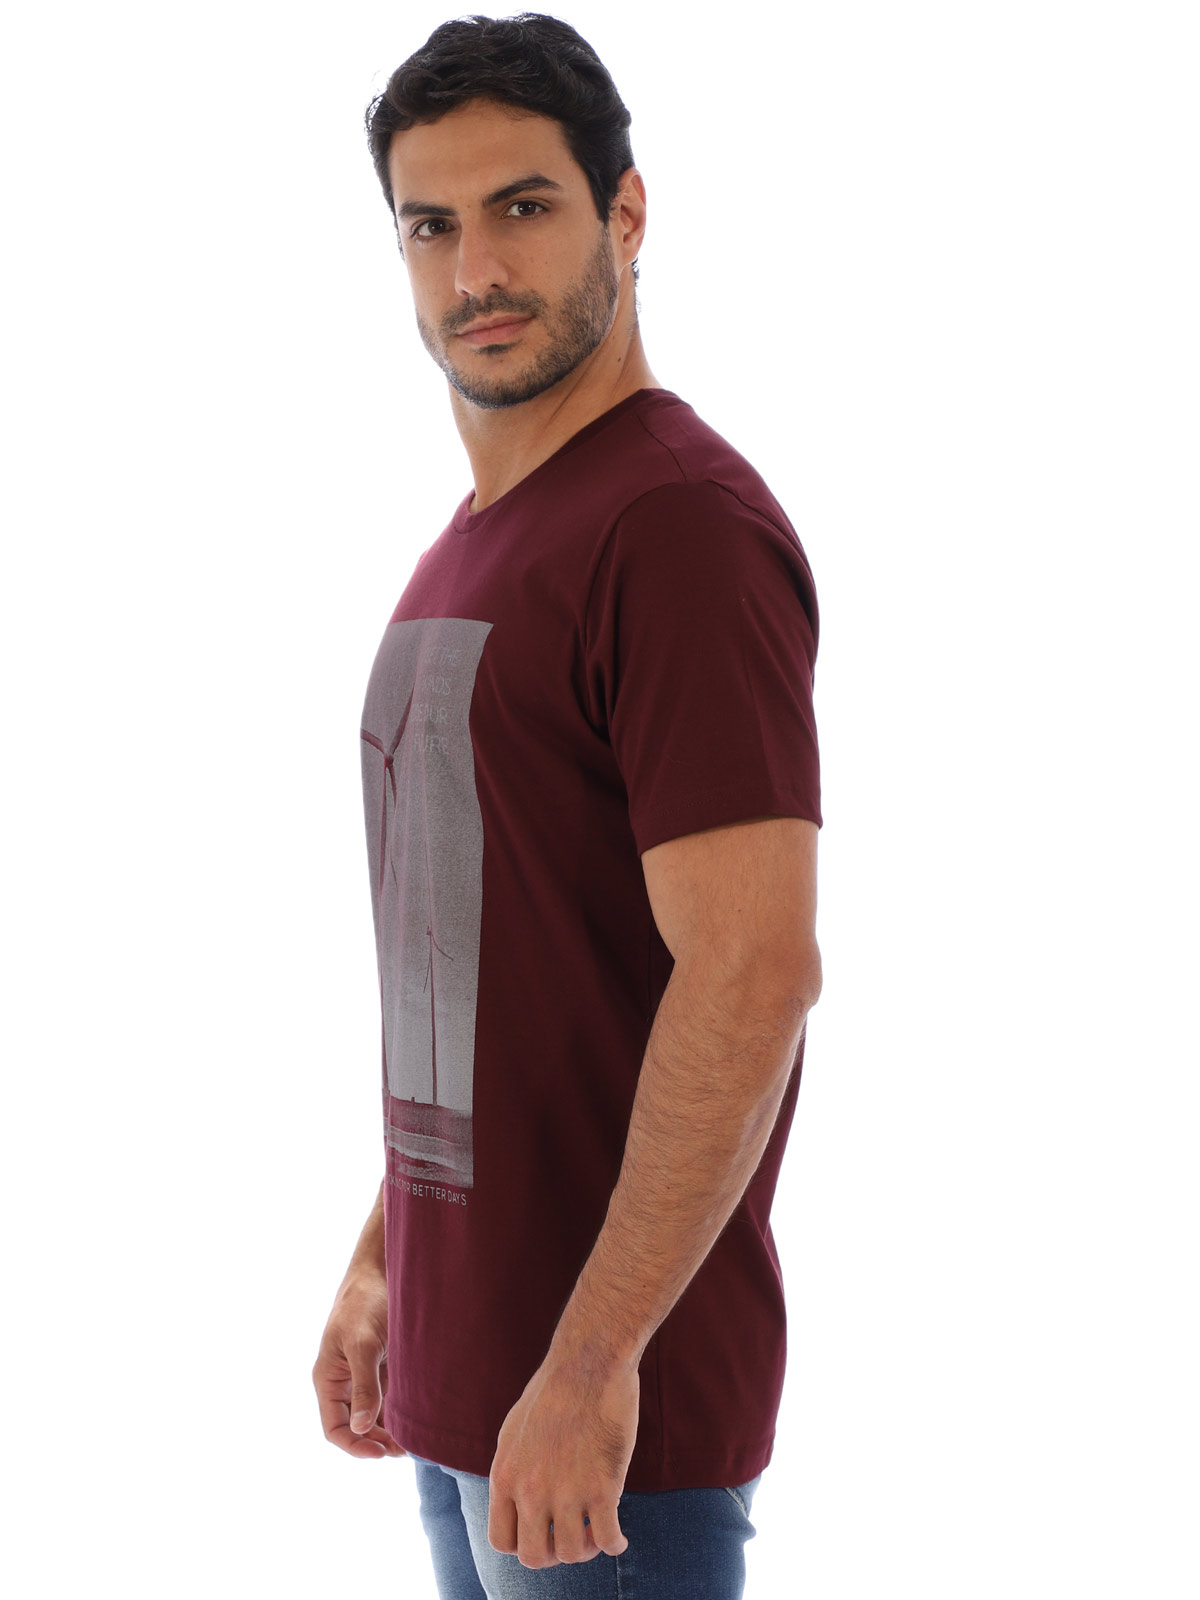 Camiseta Masculina Básica Manga Curta Estampa Aeolic Vinho